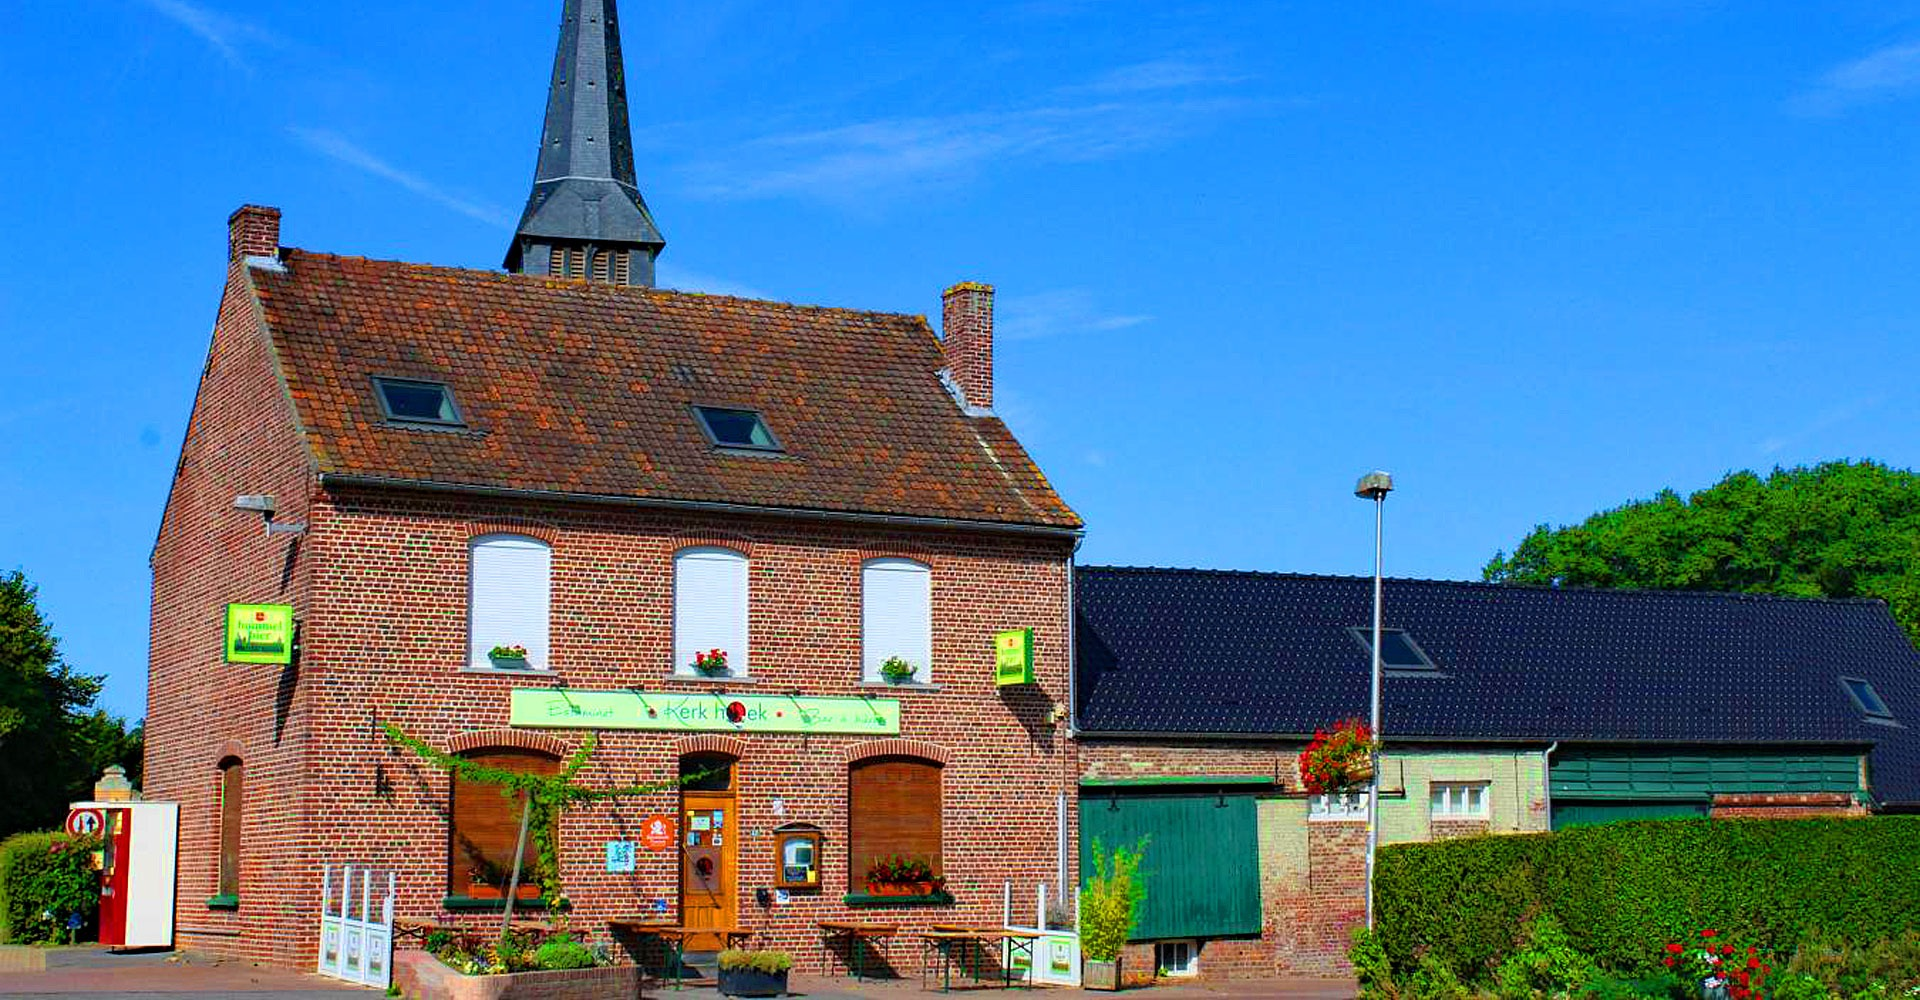 Het Kerk hoek - Estaminets en Nord 5